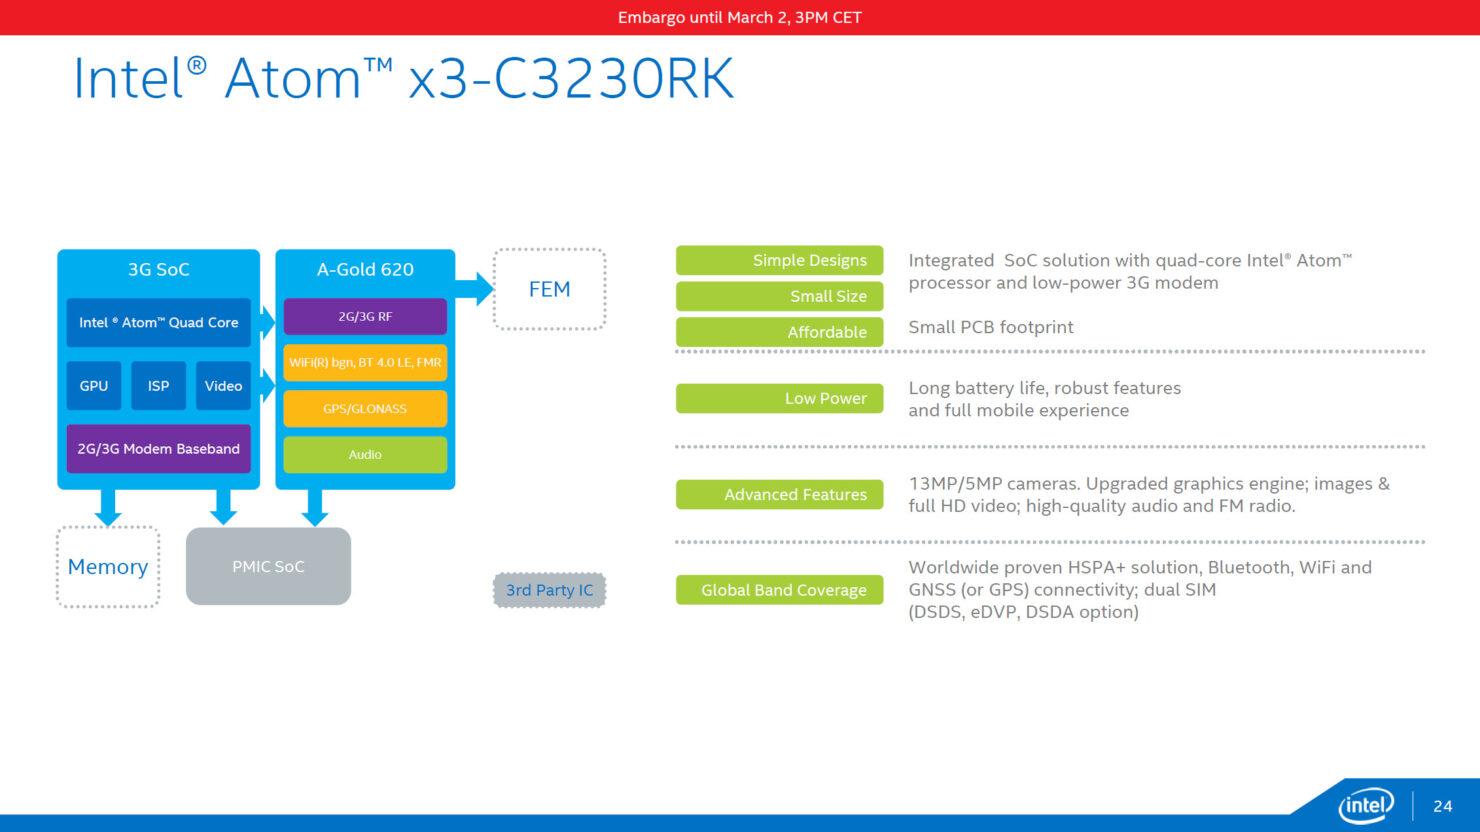 intel-cherry-trail_atom-x3-c3230rk